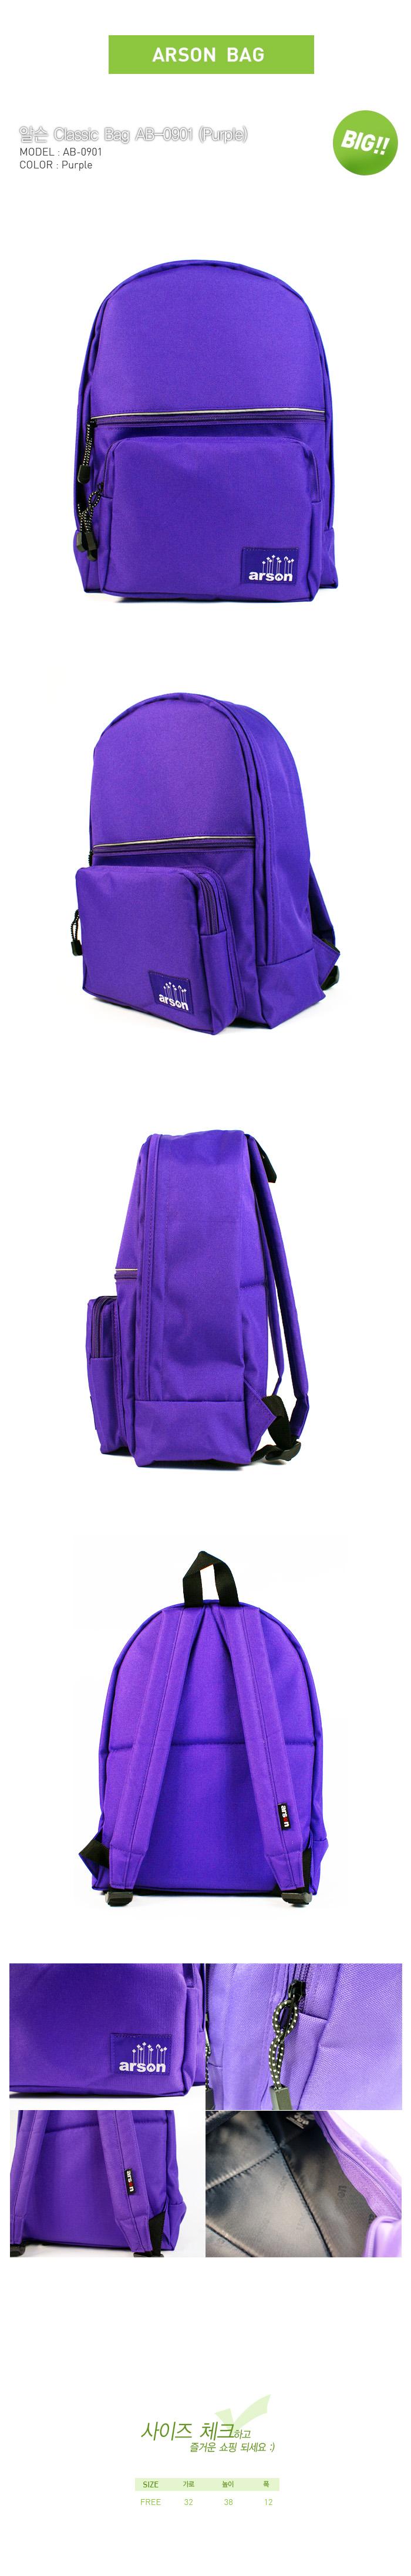 [ ARSON ] AB-0901 (Purple)/Backpack School Bag